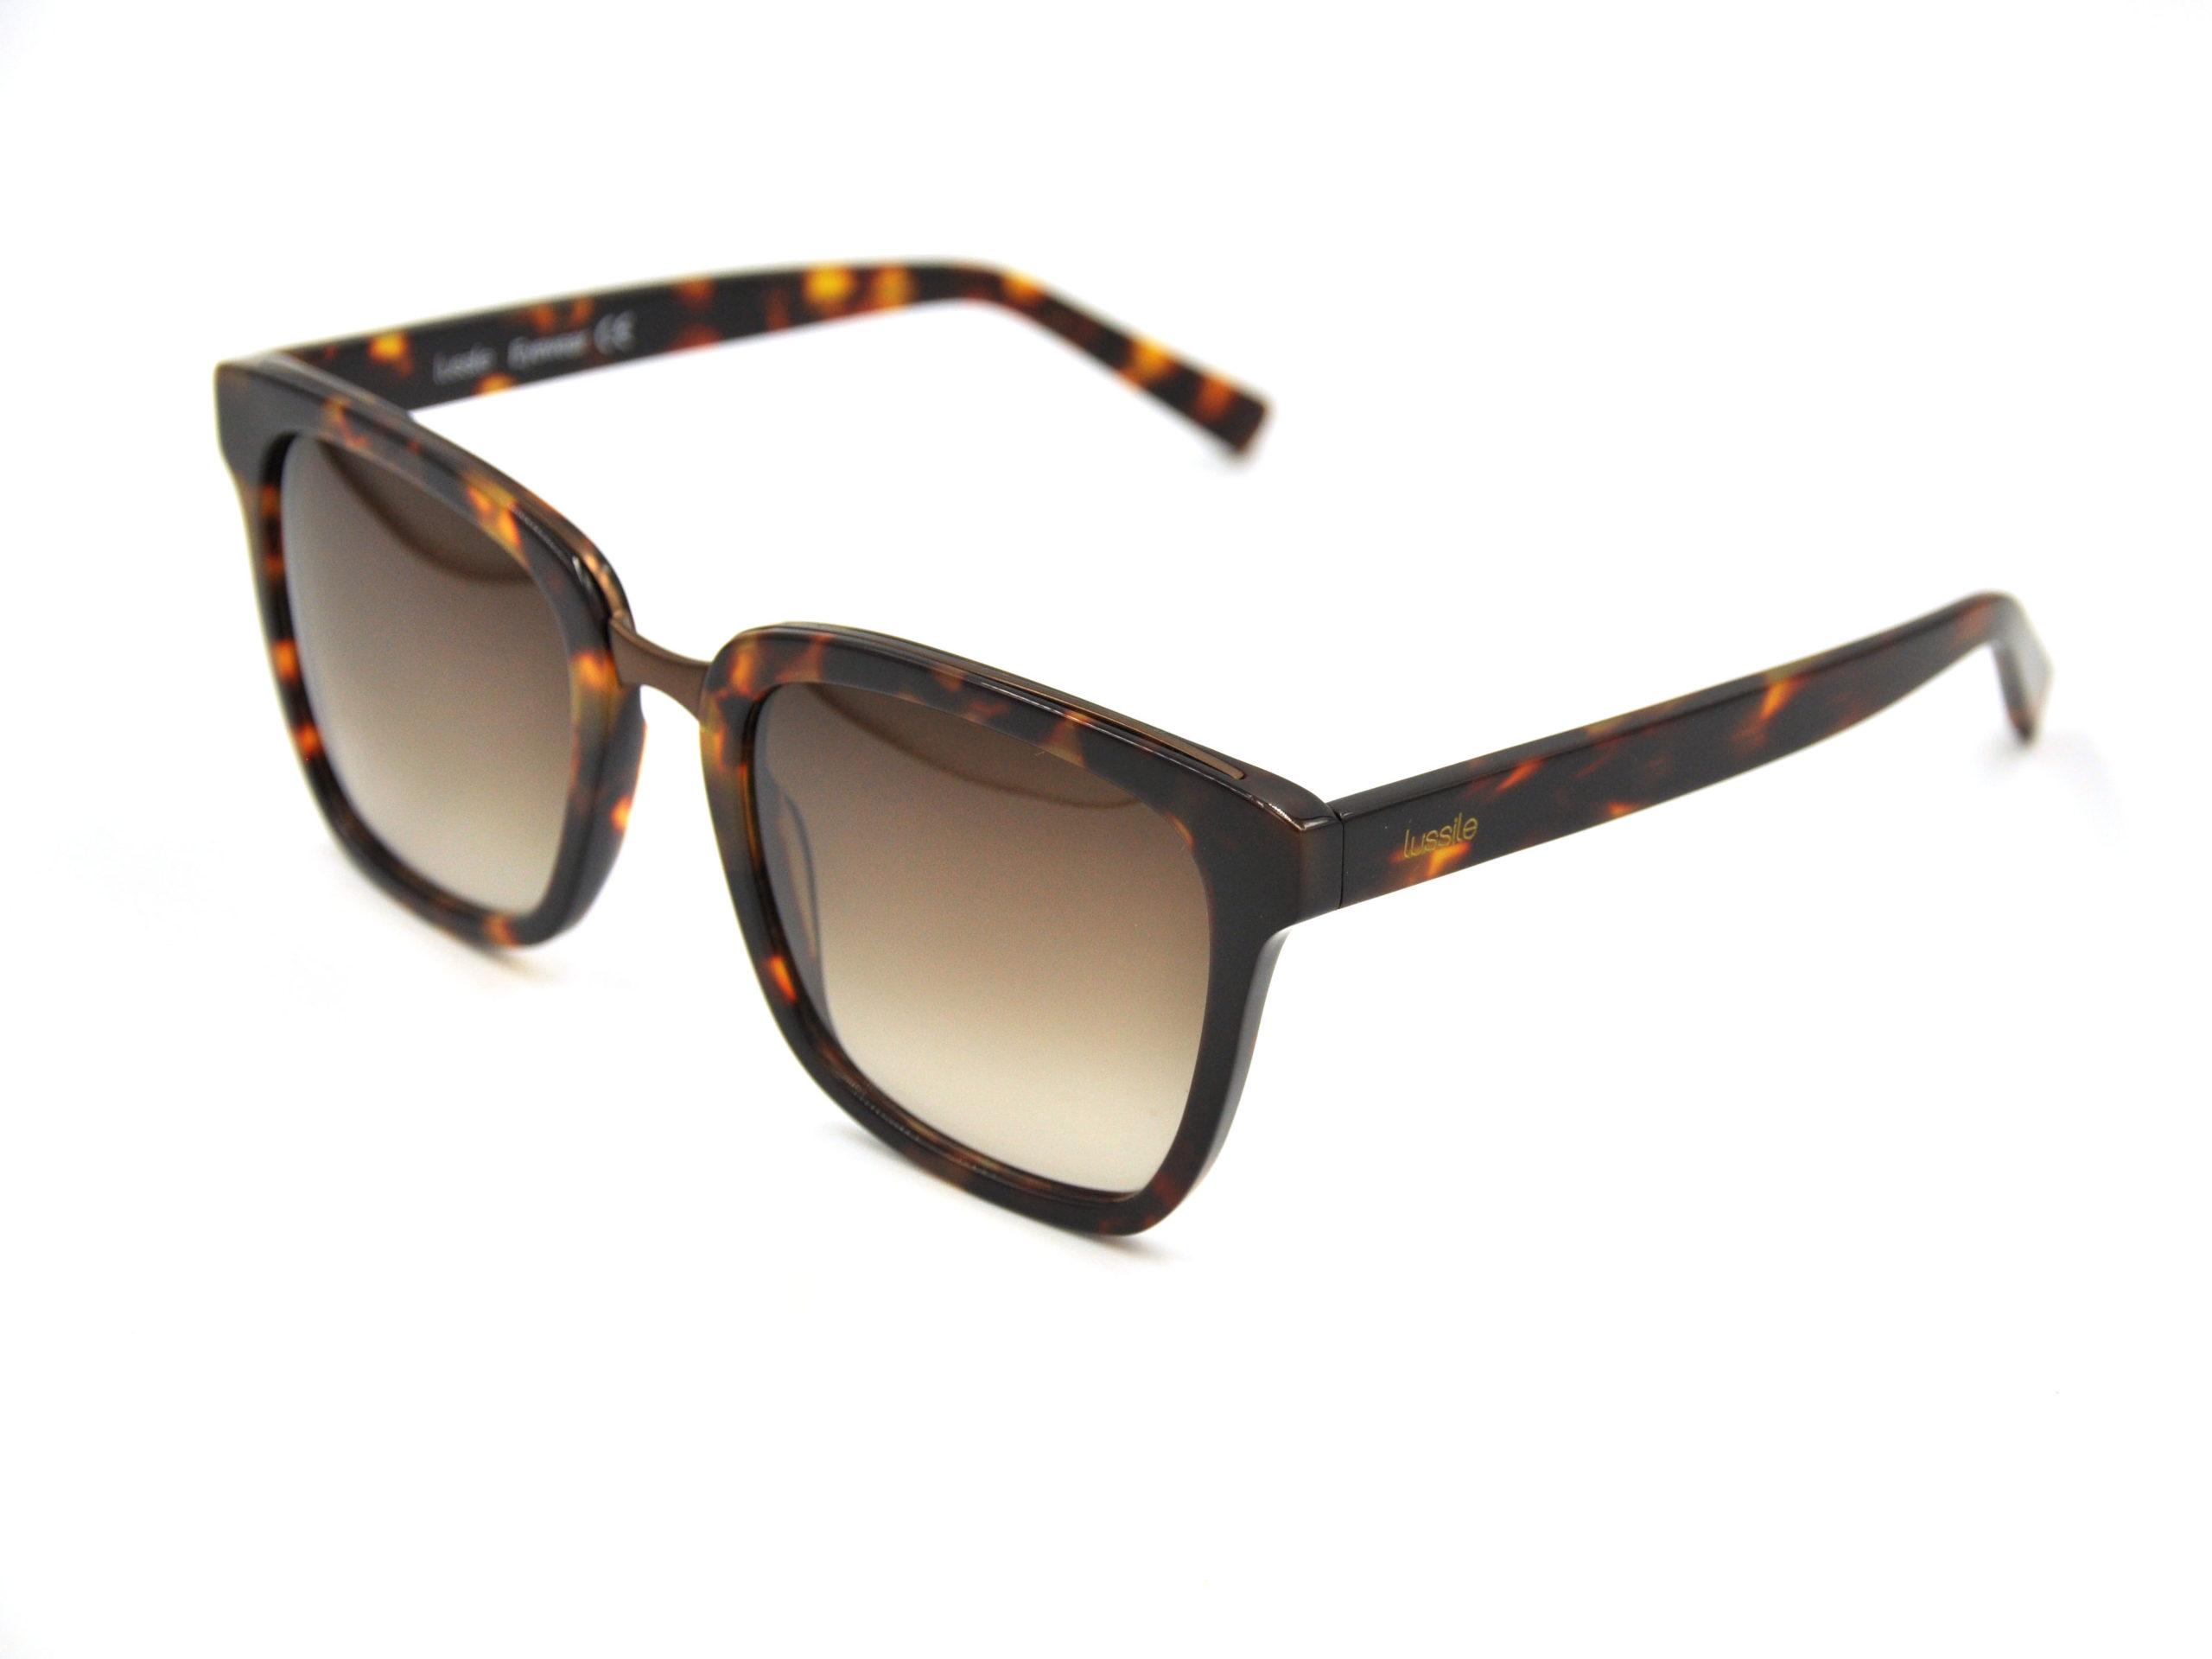 Lussile LS31252 LK04 Sunglasses 2020